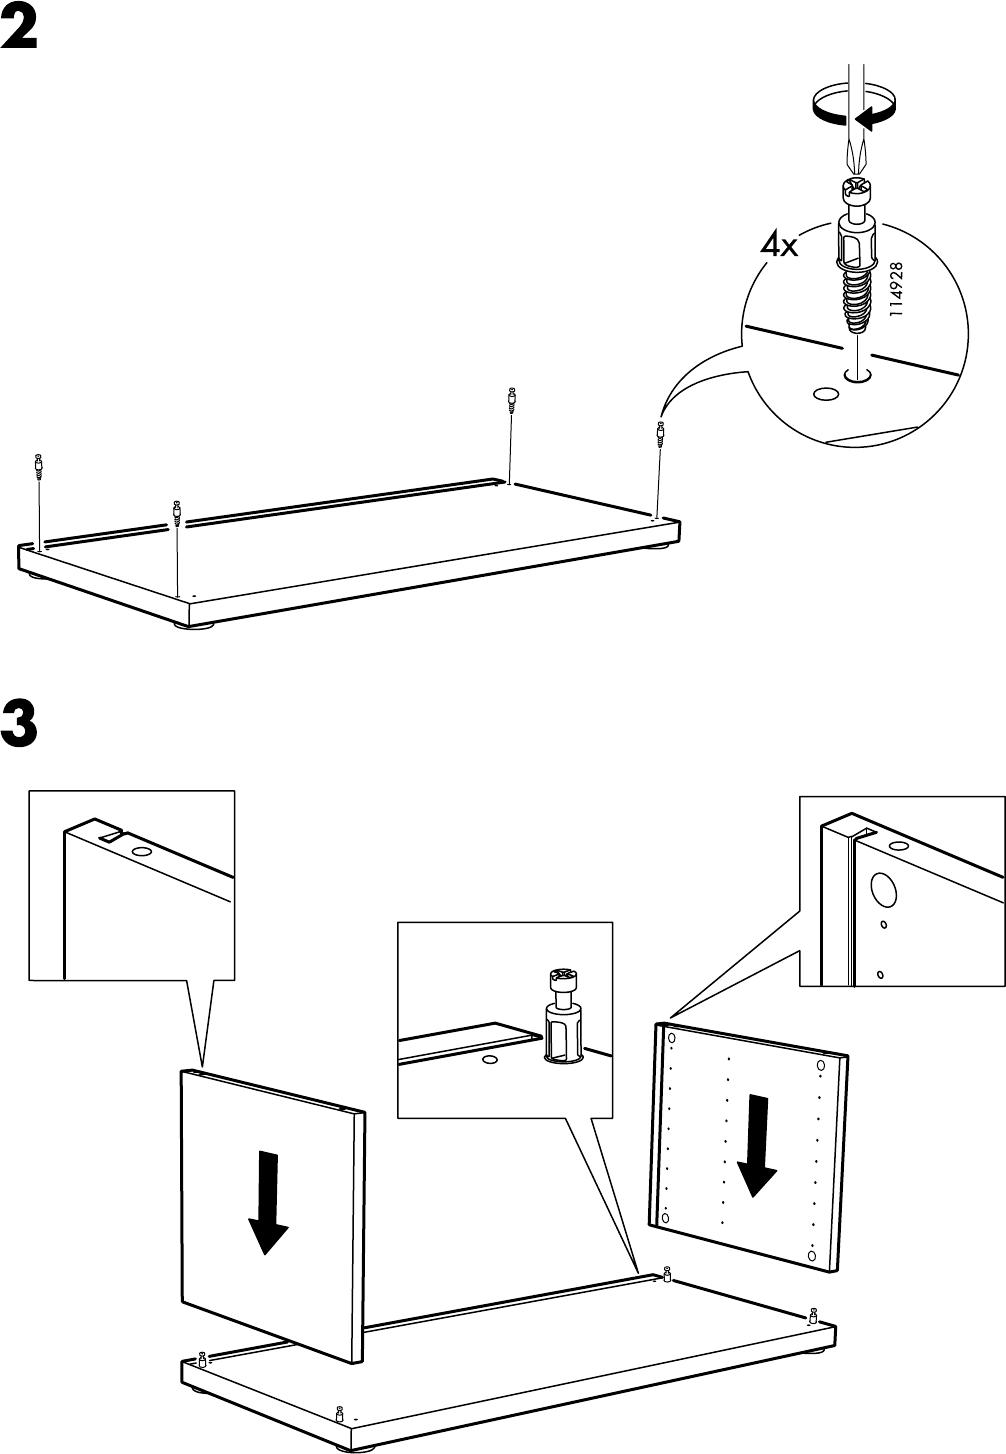 Ikea Mosjo Tv Meubel.Handleiding Ikea Mosjo Tv Meubel Pagina 4 Van 8 Alle Talen